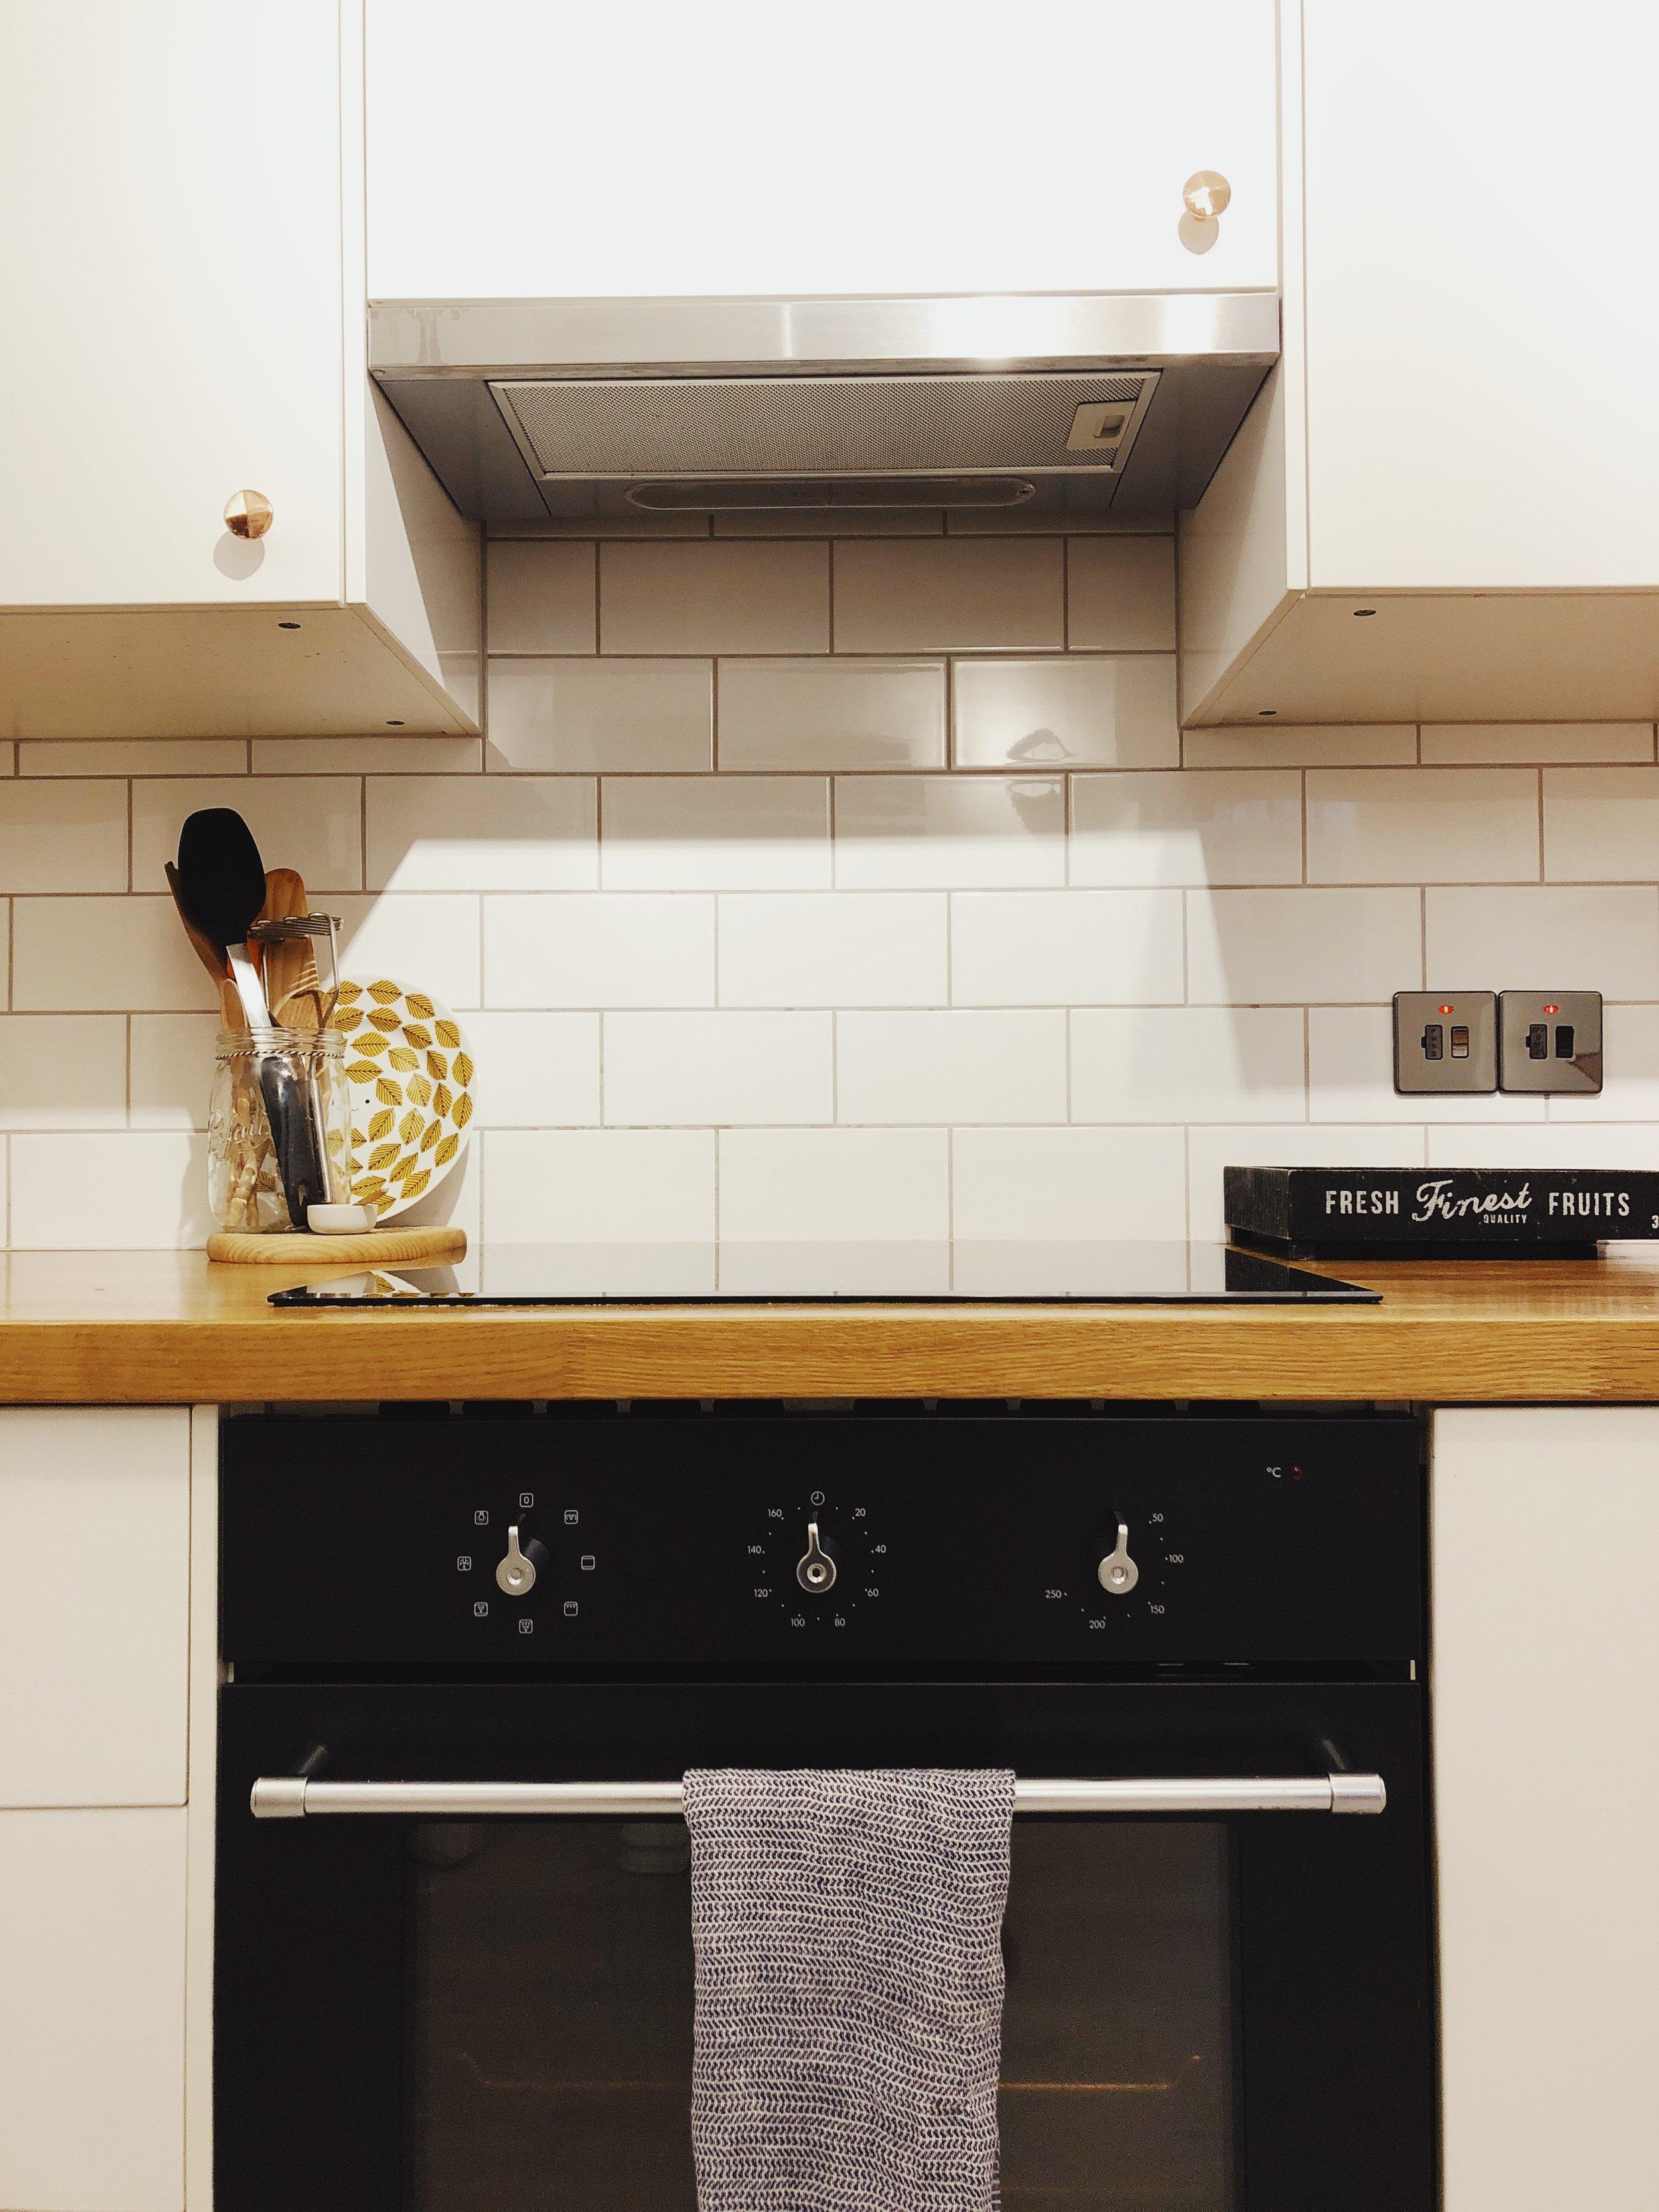 small kitchen1.JPG